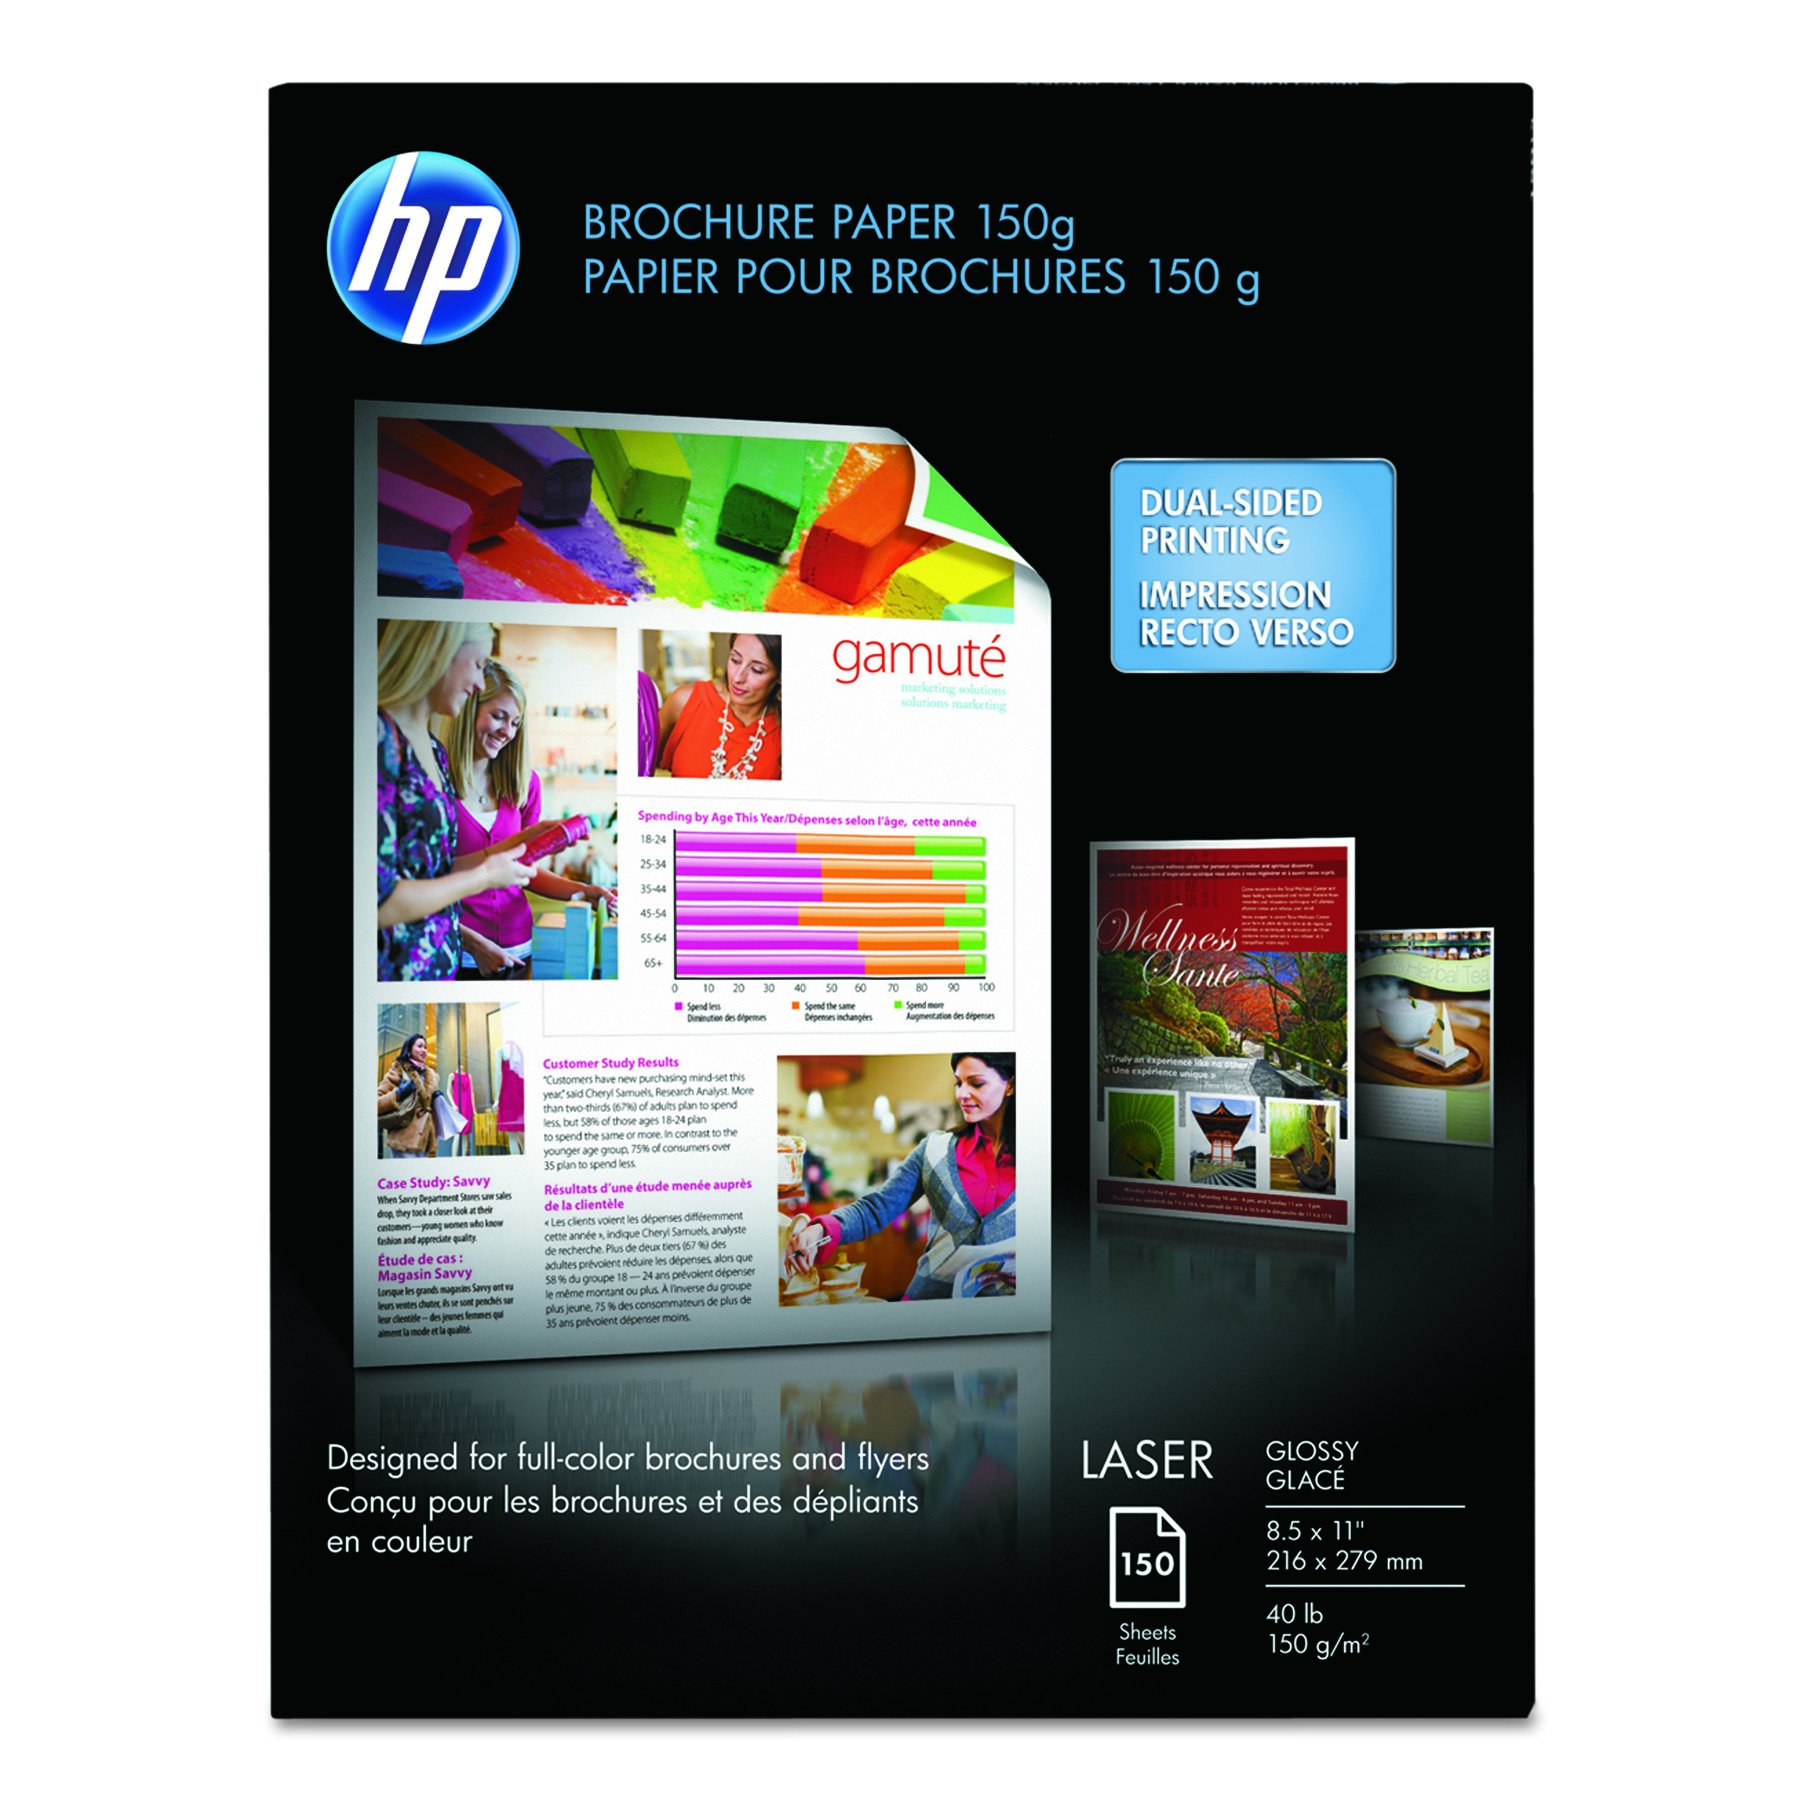 HP Brochure Paper, Glossy, 8.5x11, 150 Sheets